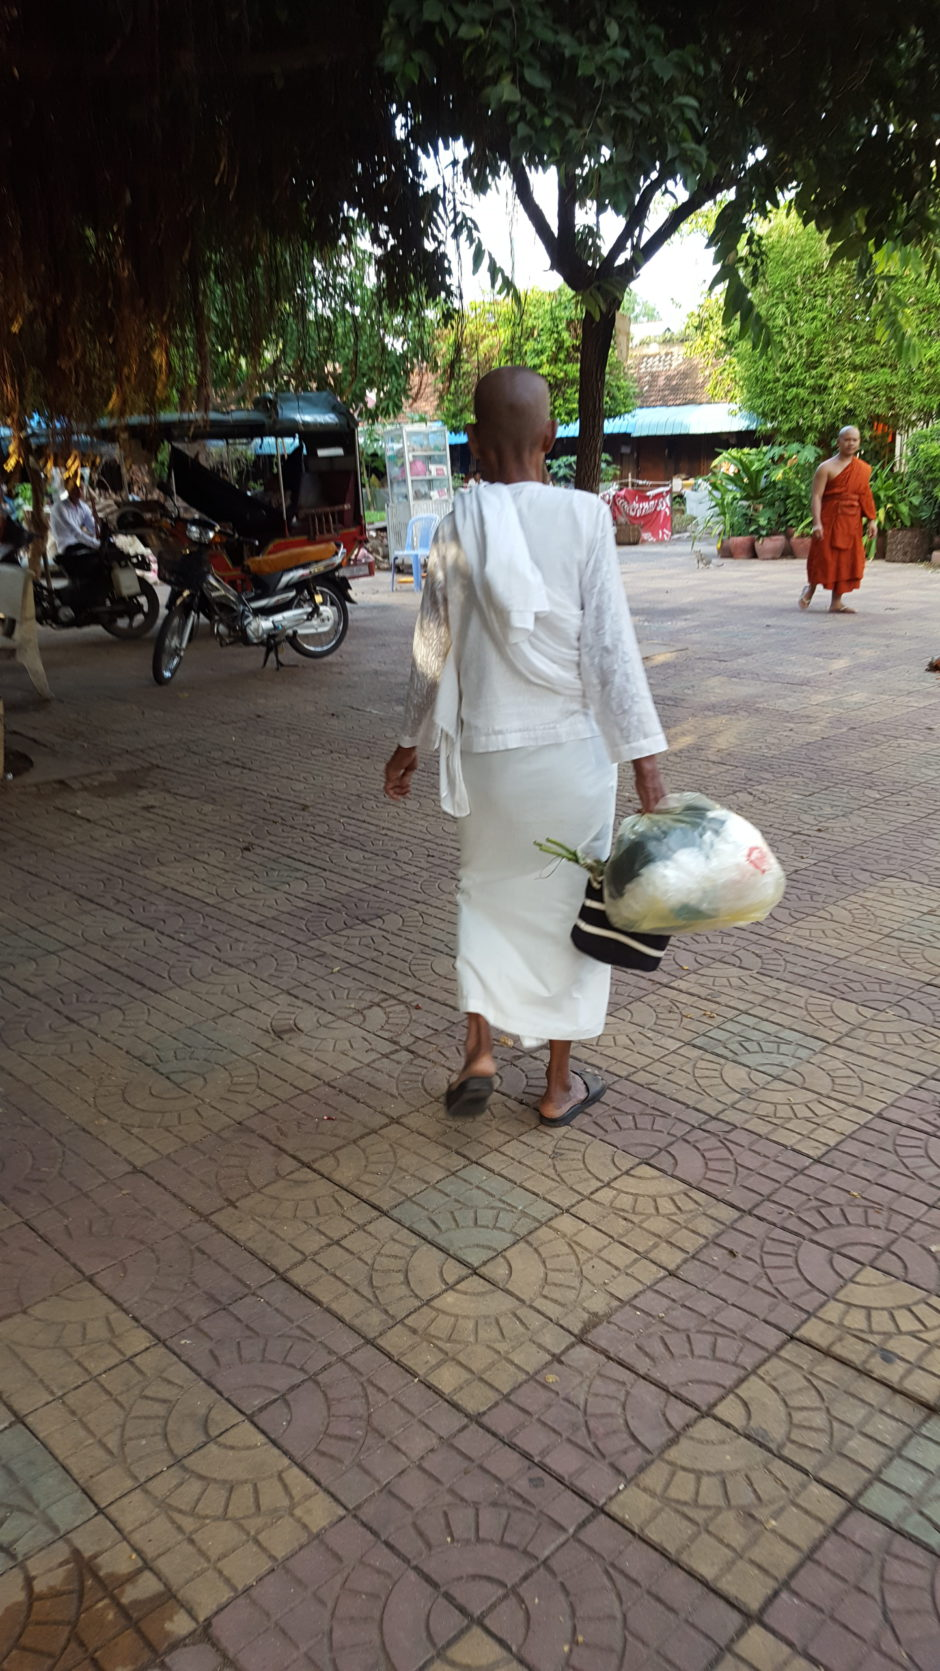 Chamso leaving pagoda phnom penh elderly